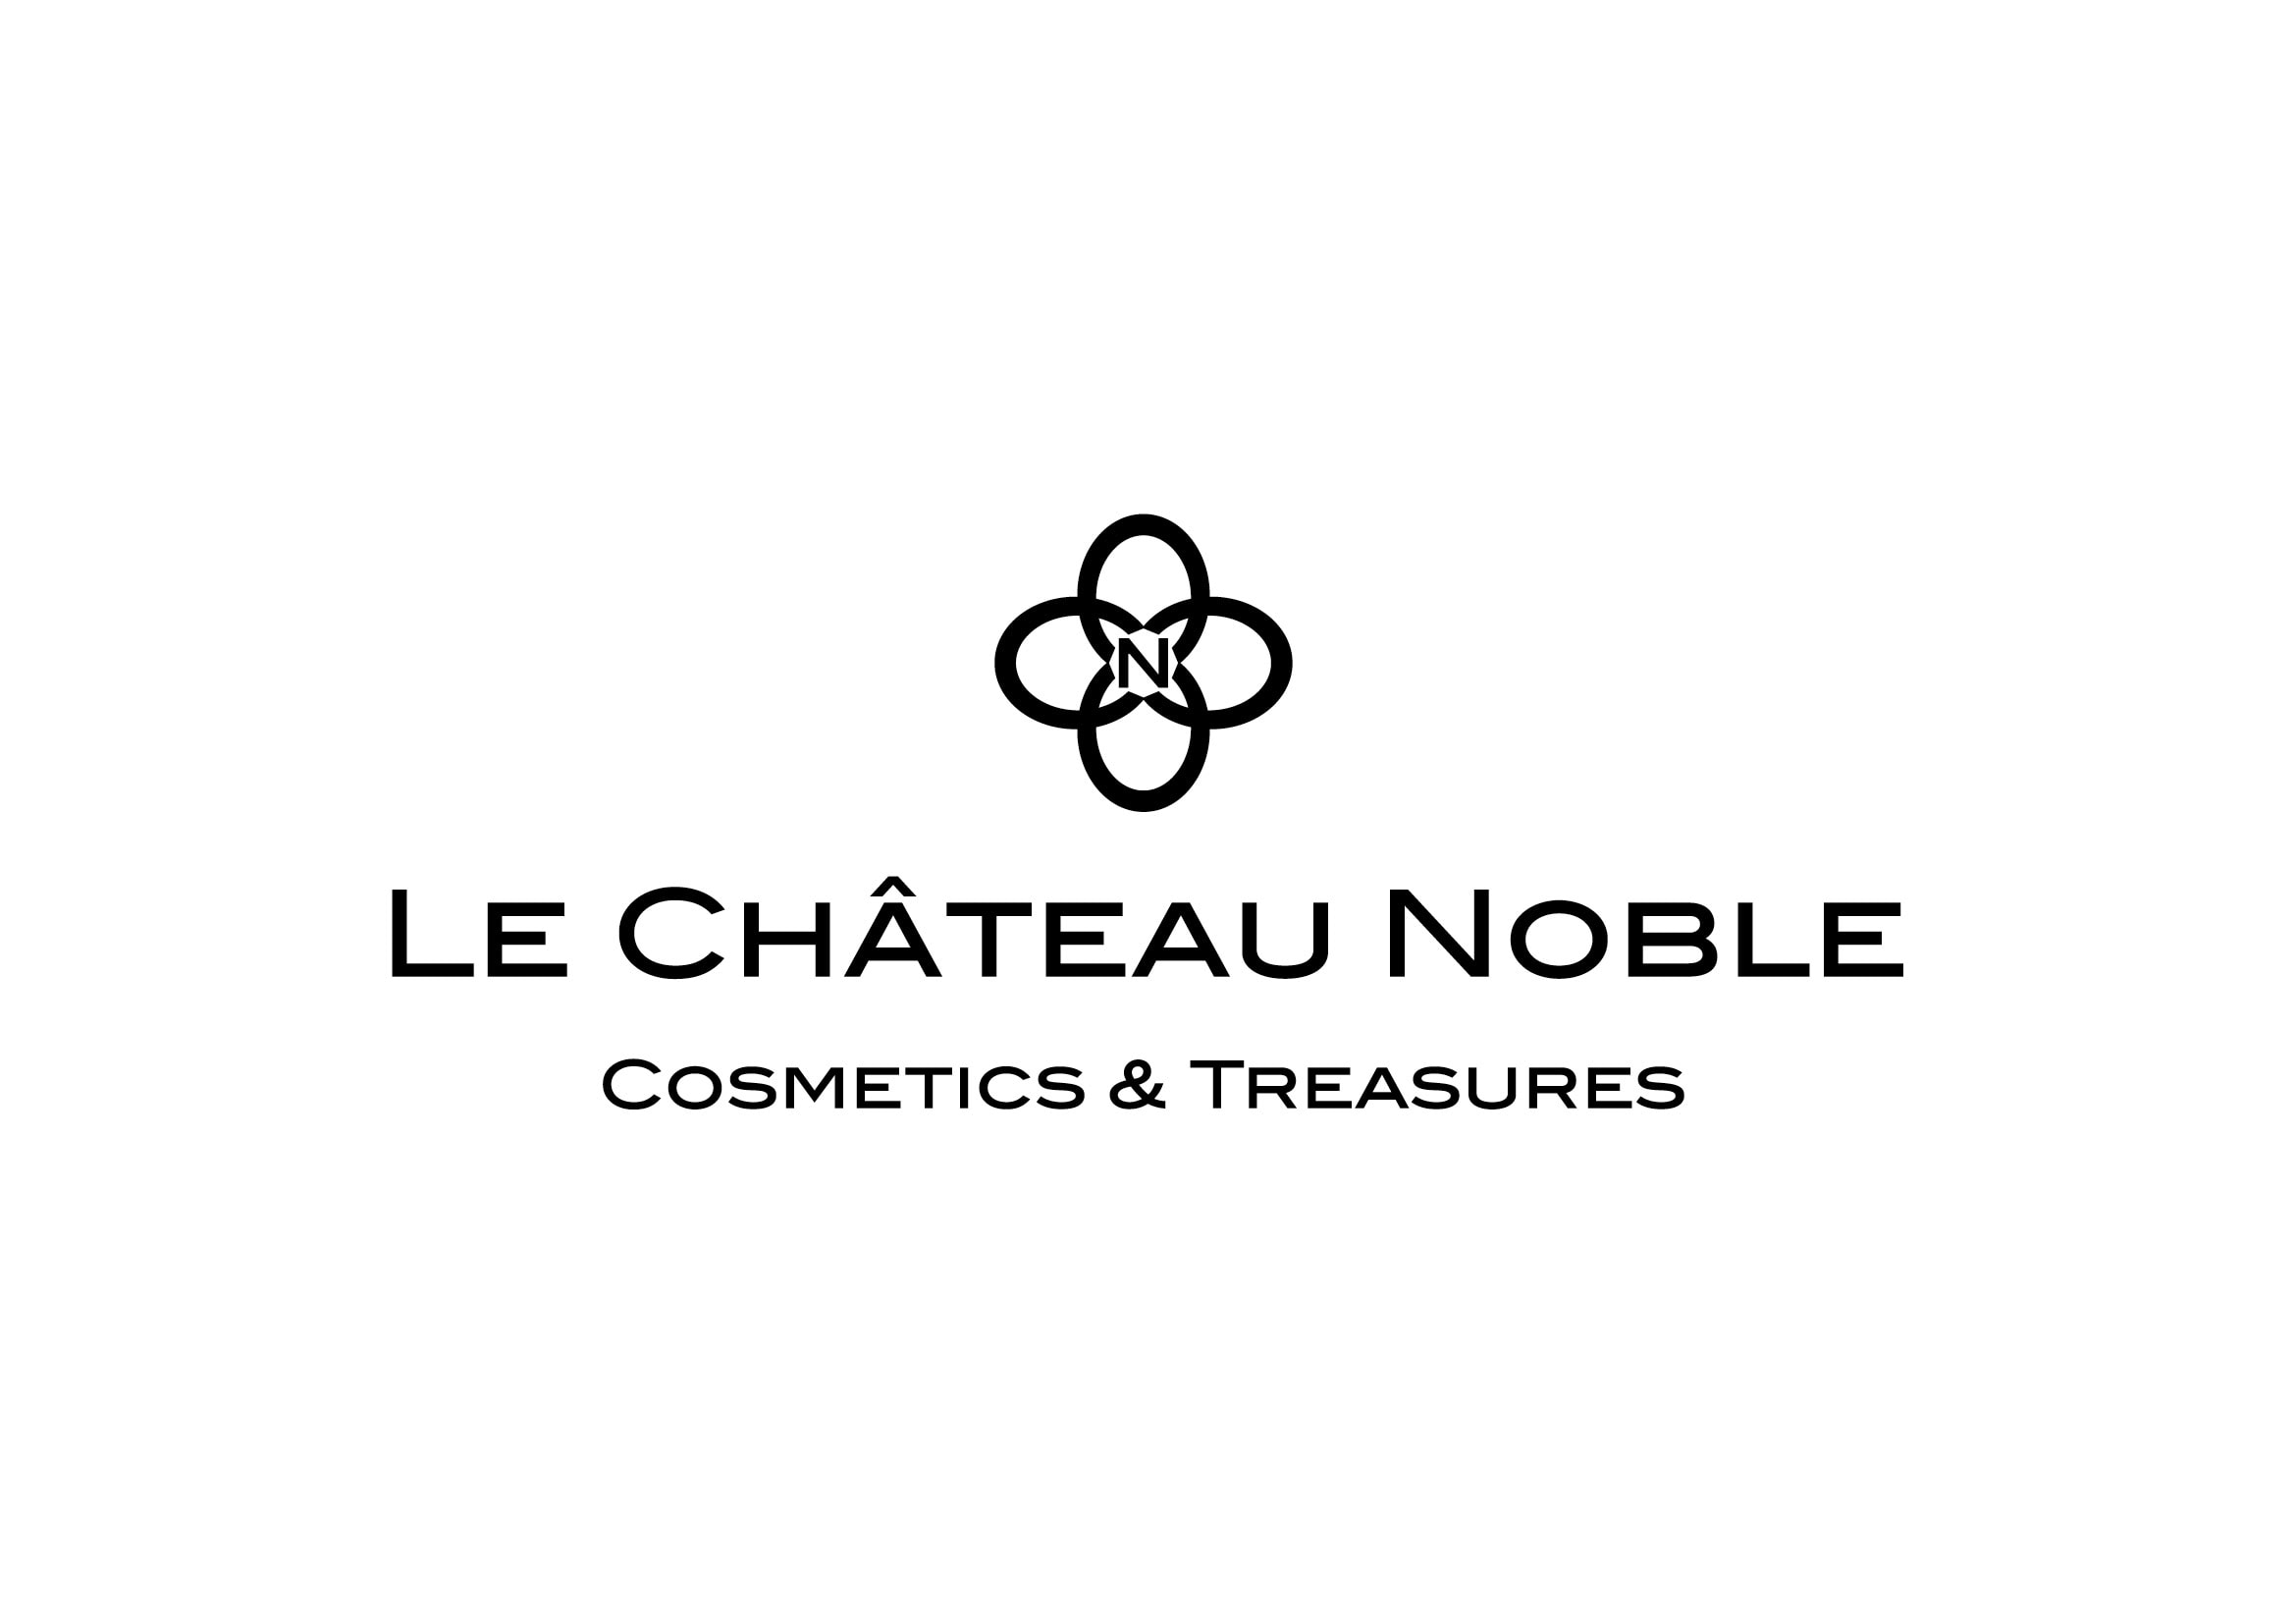 Gestaltung Logo für Le Chateau Noble durch Webdesigner Ronald Wissler